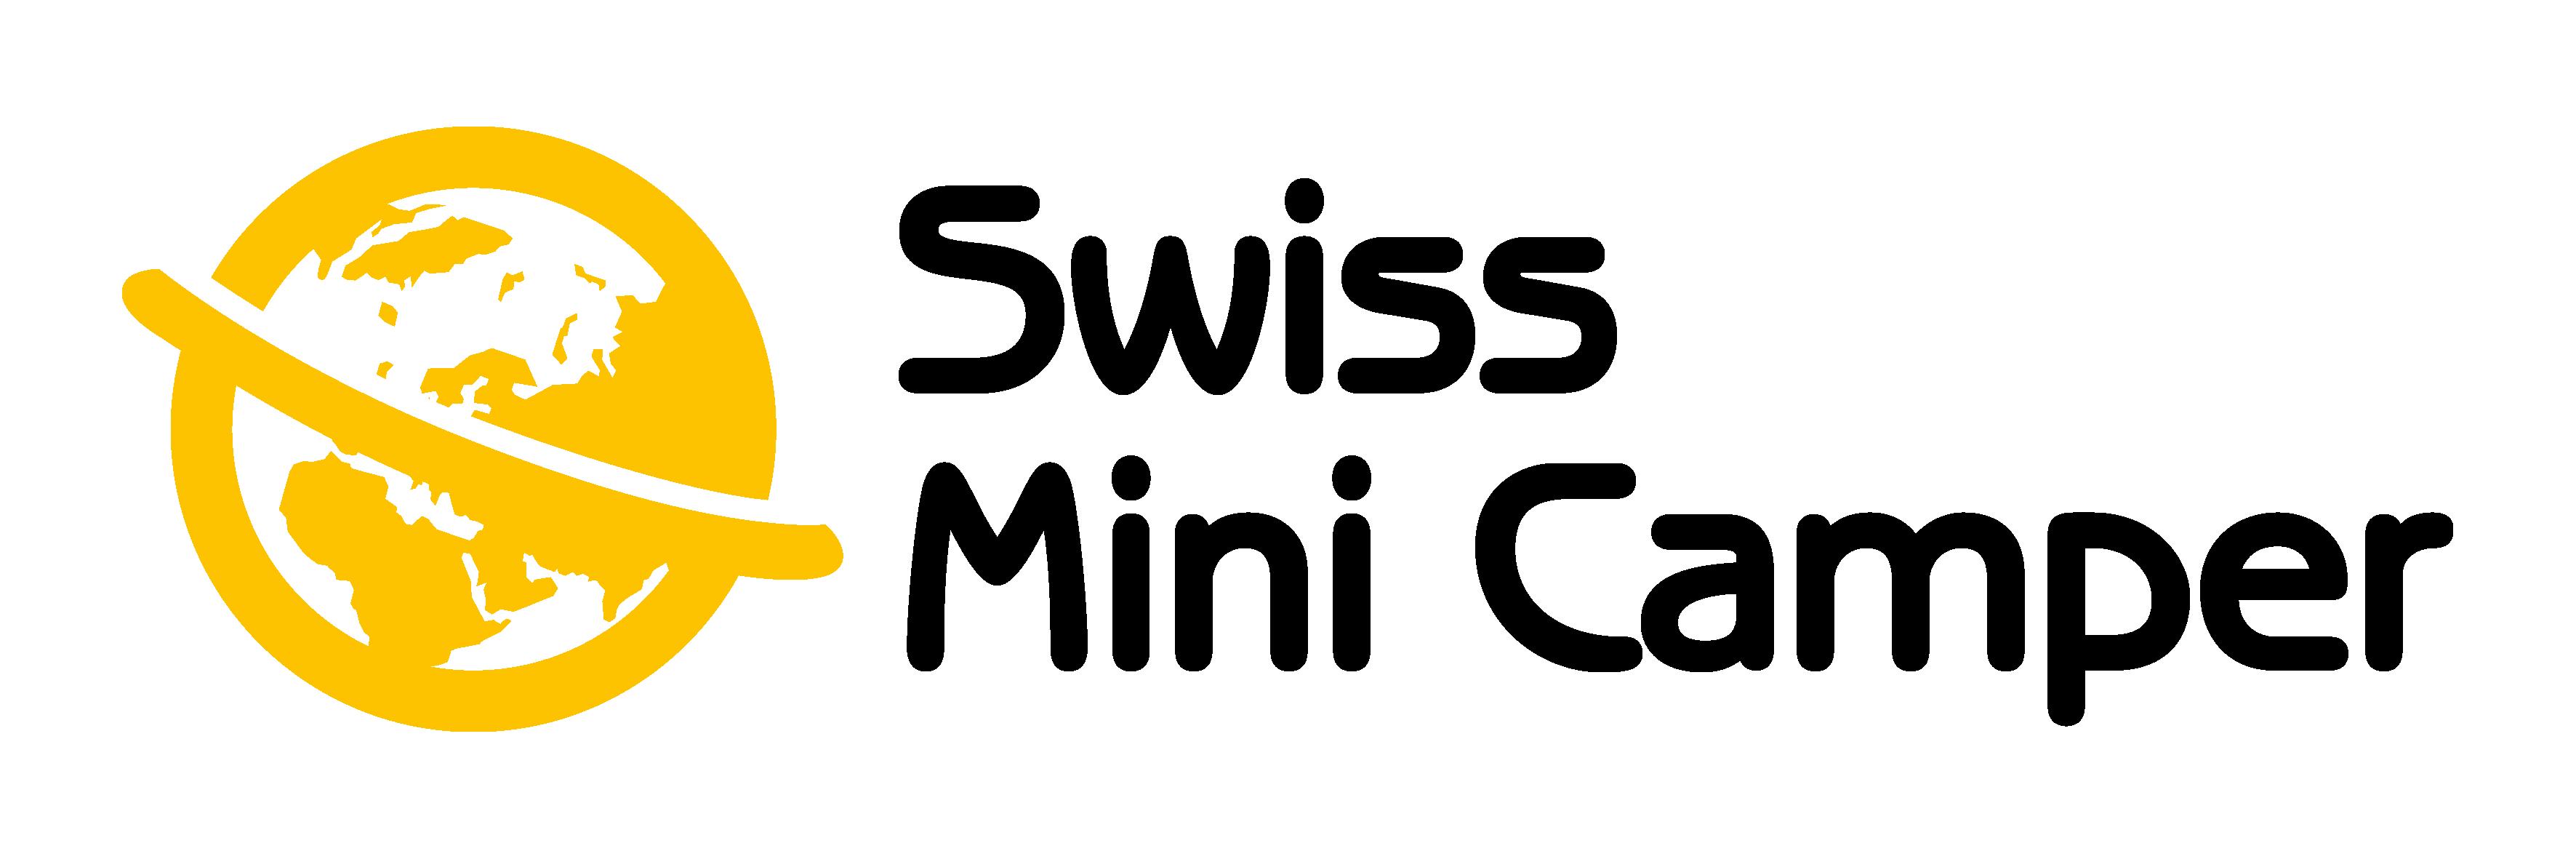 Swissminicamper